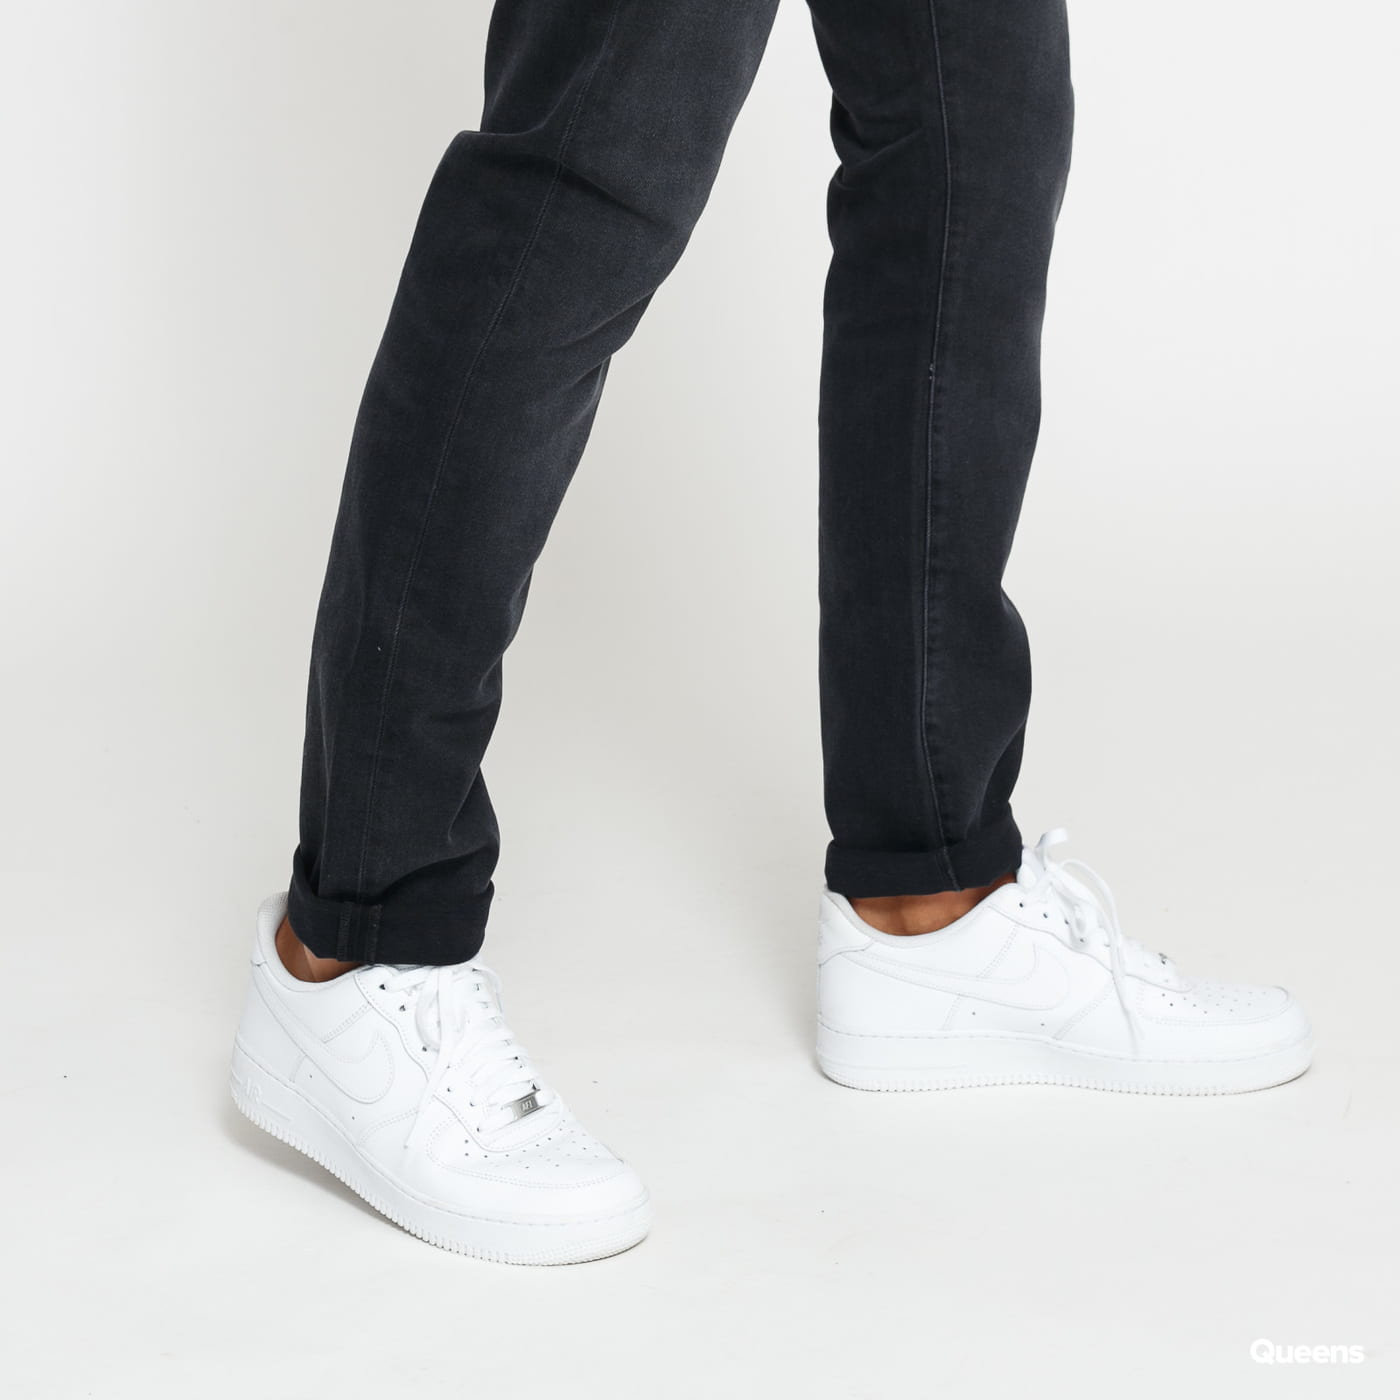 Carhartt WIP Rebel Pant black mind worn wash